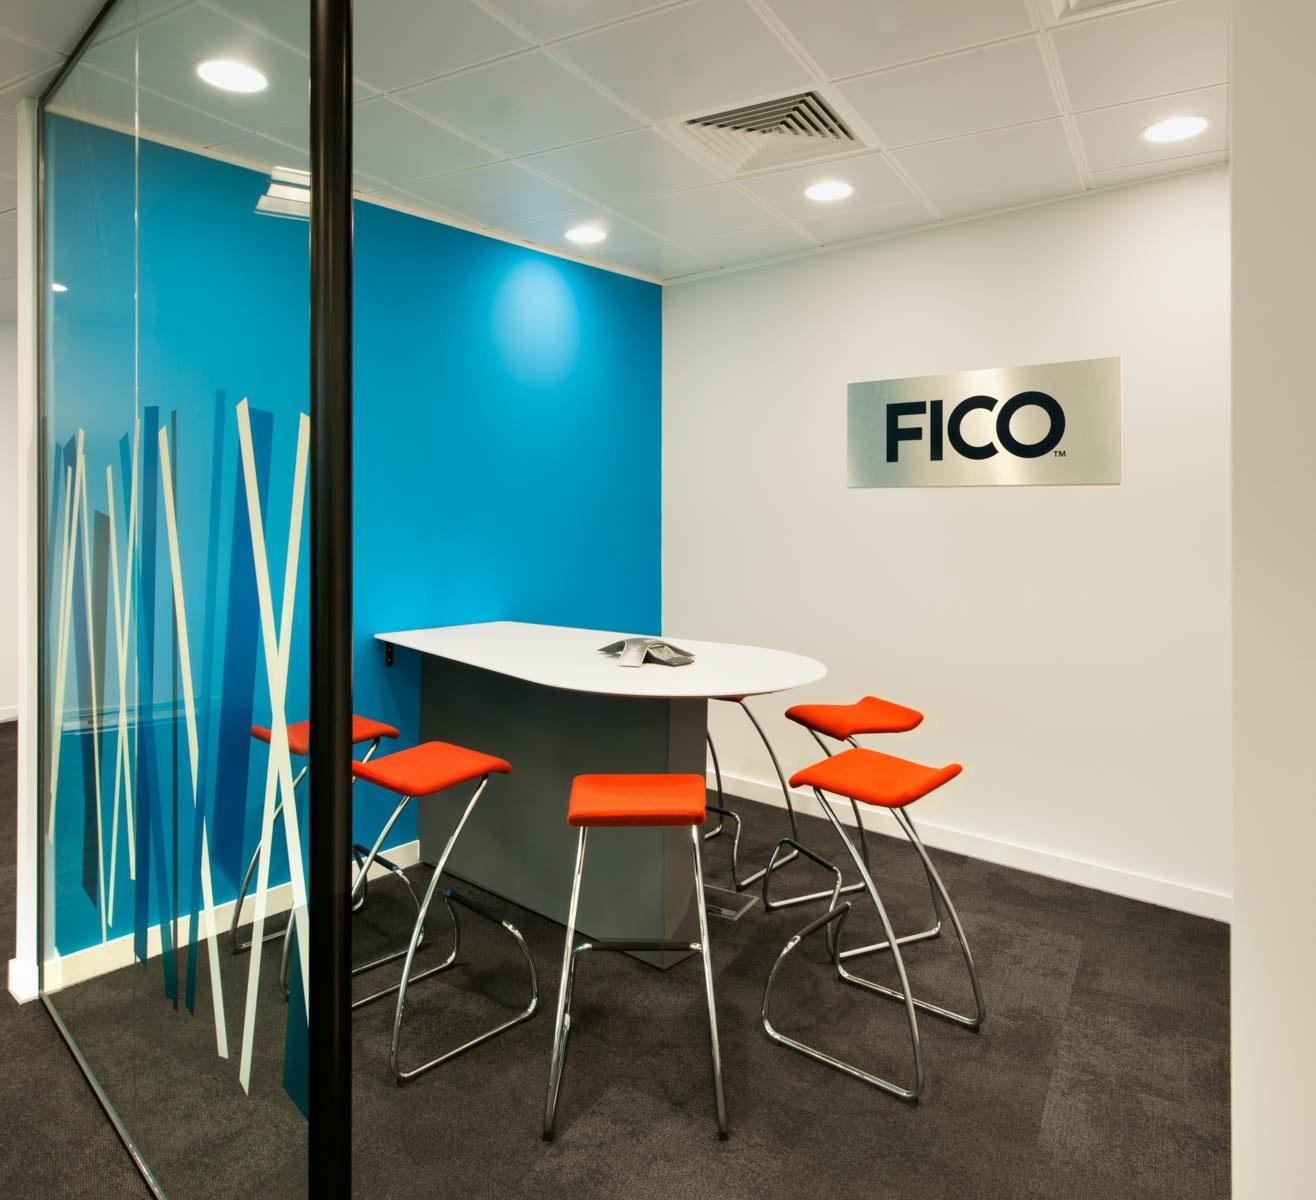 Fico collaborative meeting room design